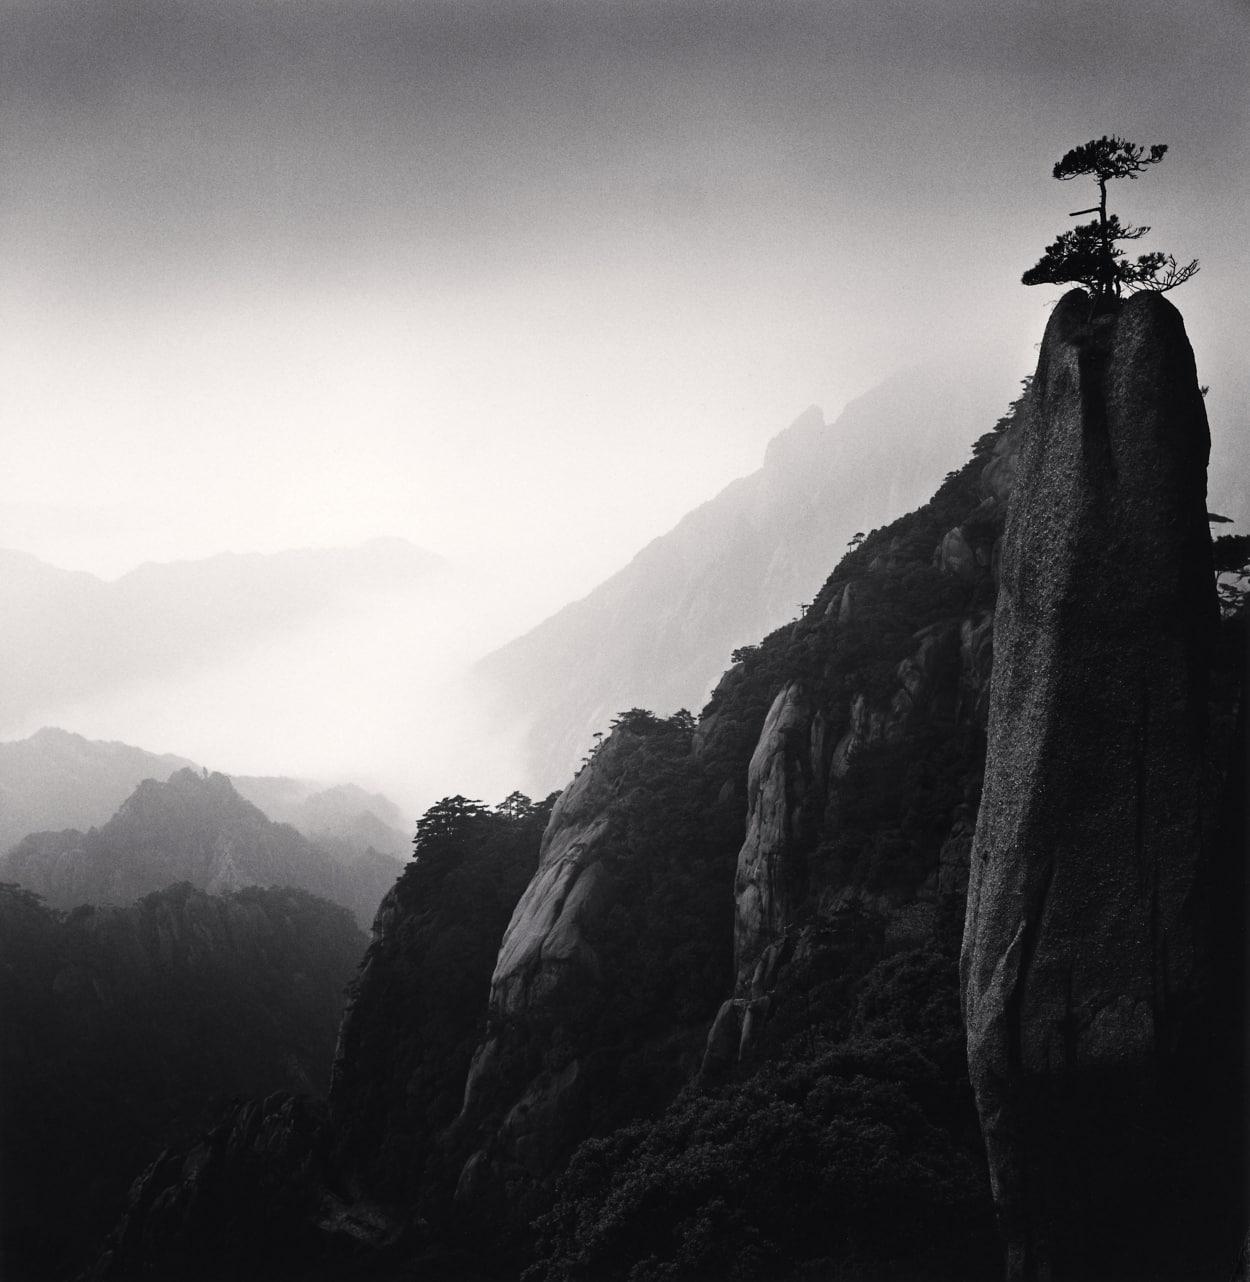 Michael Kenna - Huangshan Mountains Study-25 Anhui China 2009